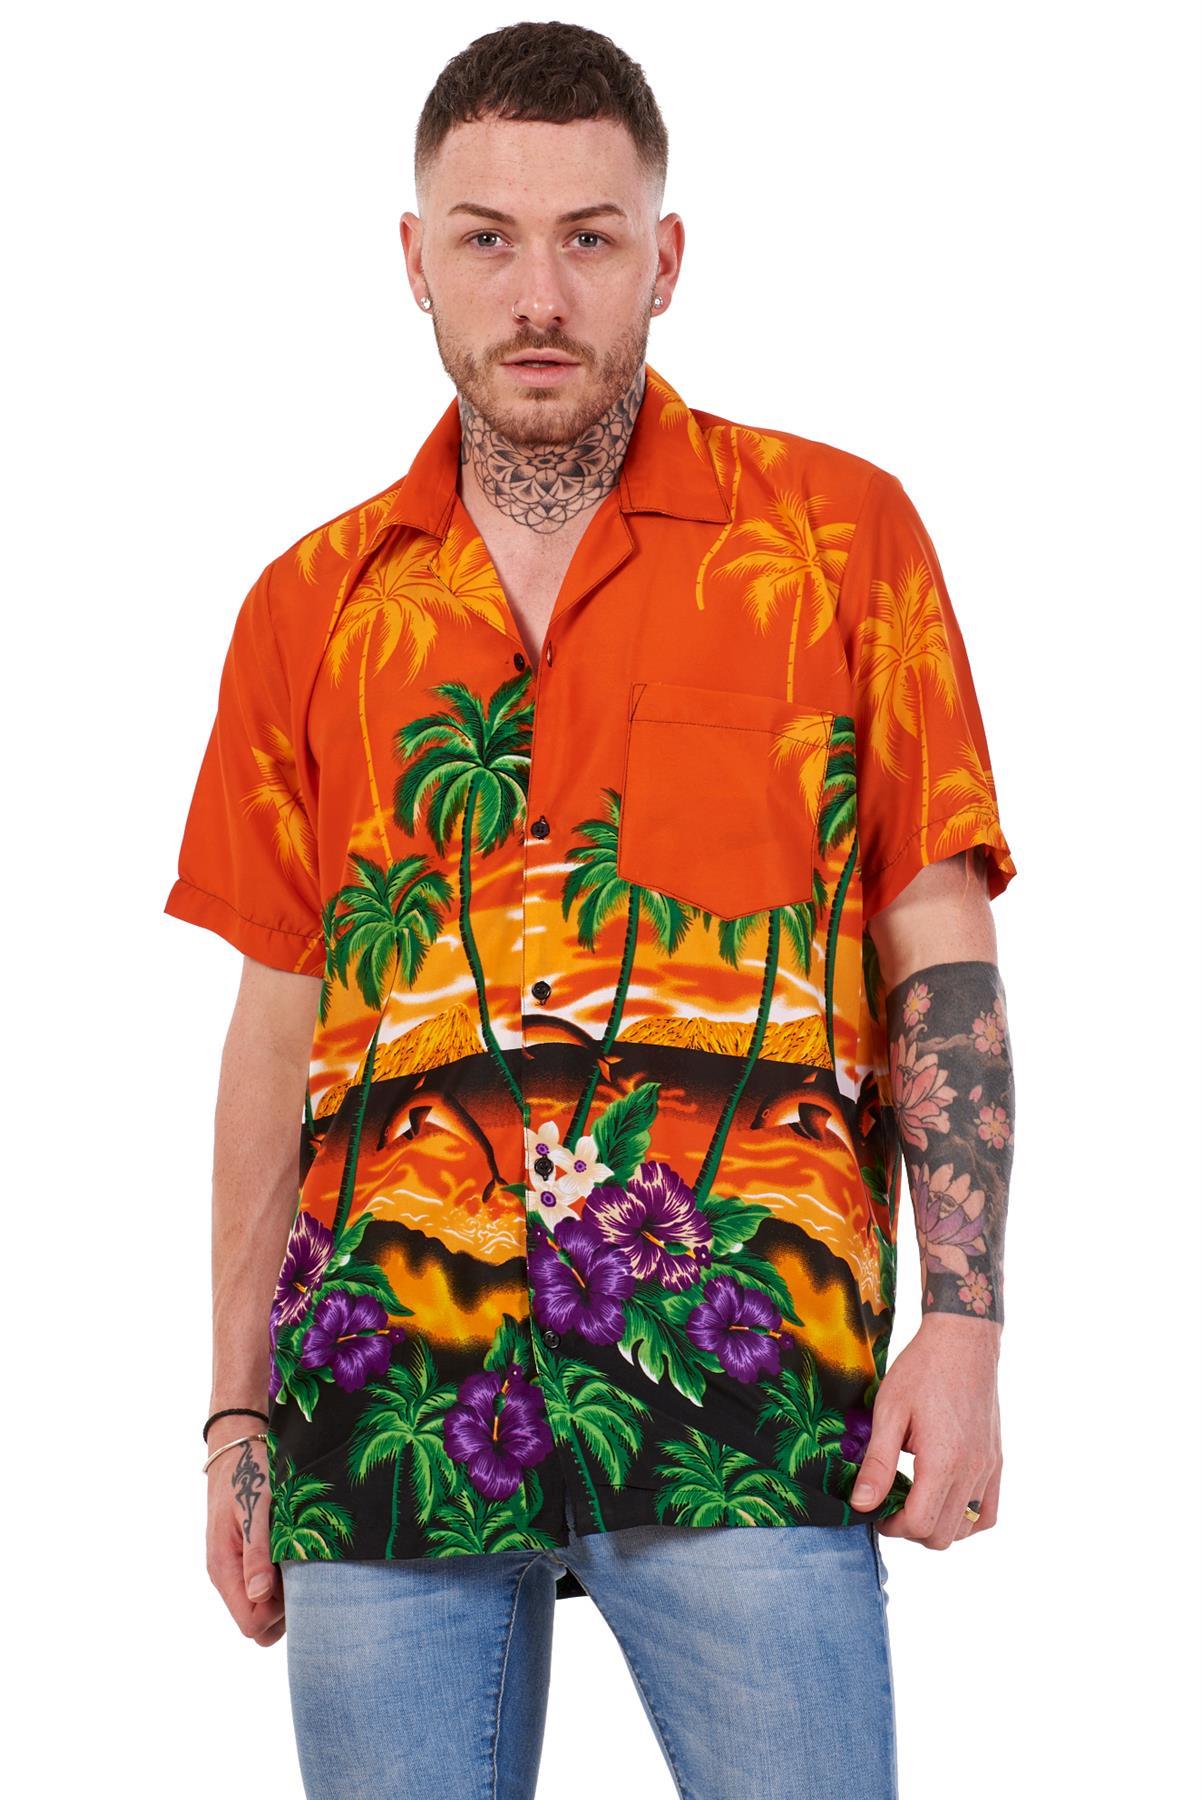 Mens-Hawaiian-Shirt-Multi-Colors-Print-Regular-Big-Size-Summer-Fancy-Dress-M-5XL thumbnail 22